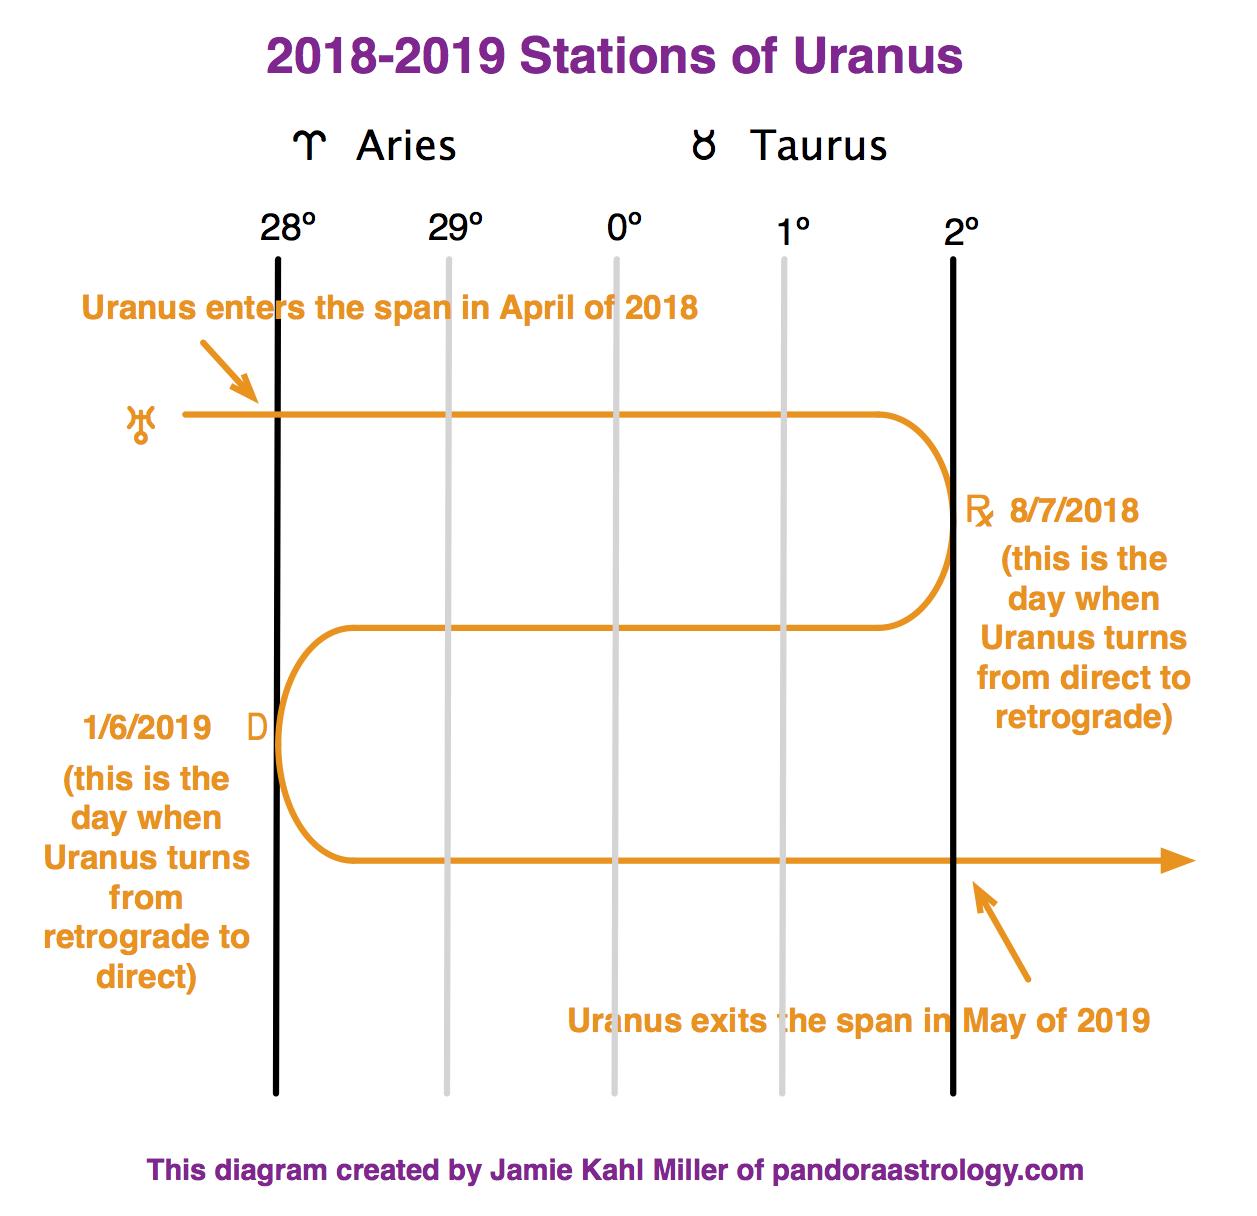 2018-2019 Stations of Uranus 4-1-18 - Pandora Astrology